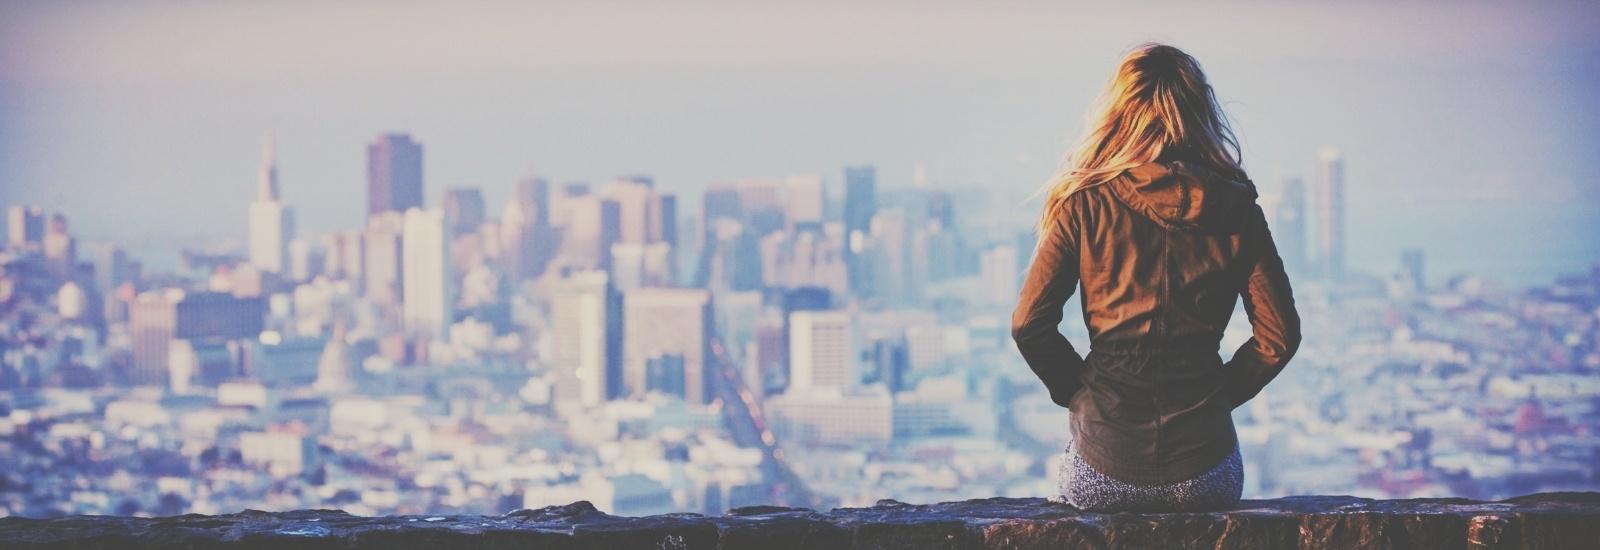 Girl looking at city-521955-edited-661128-edited